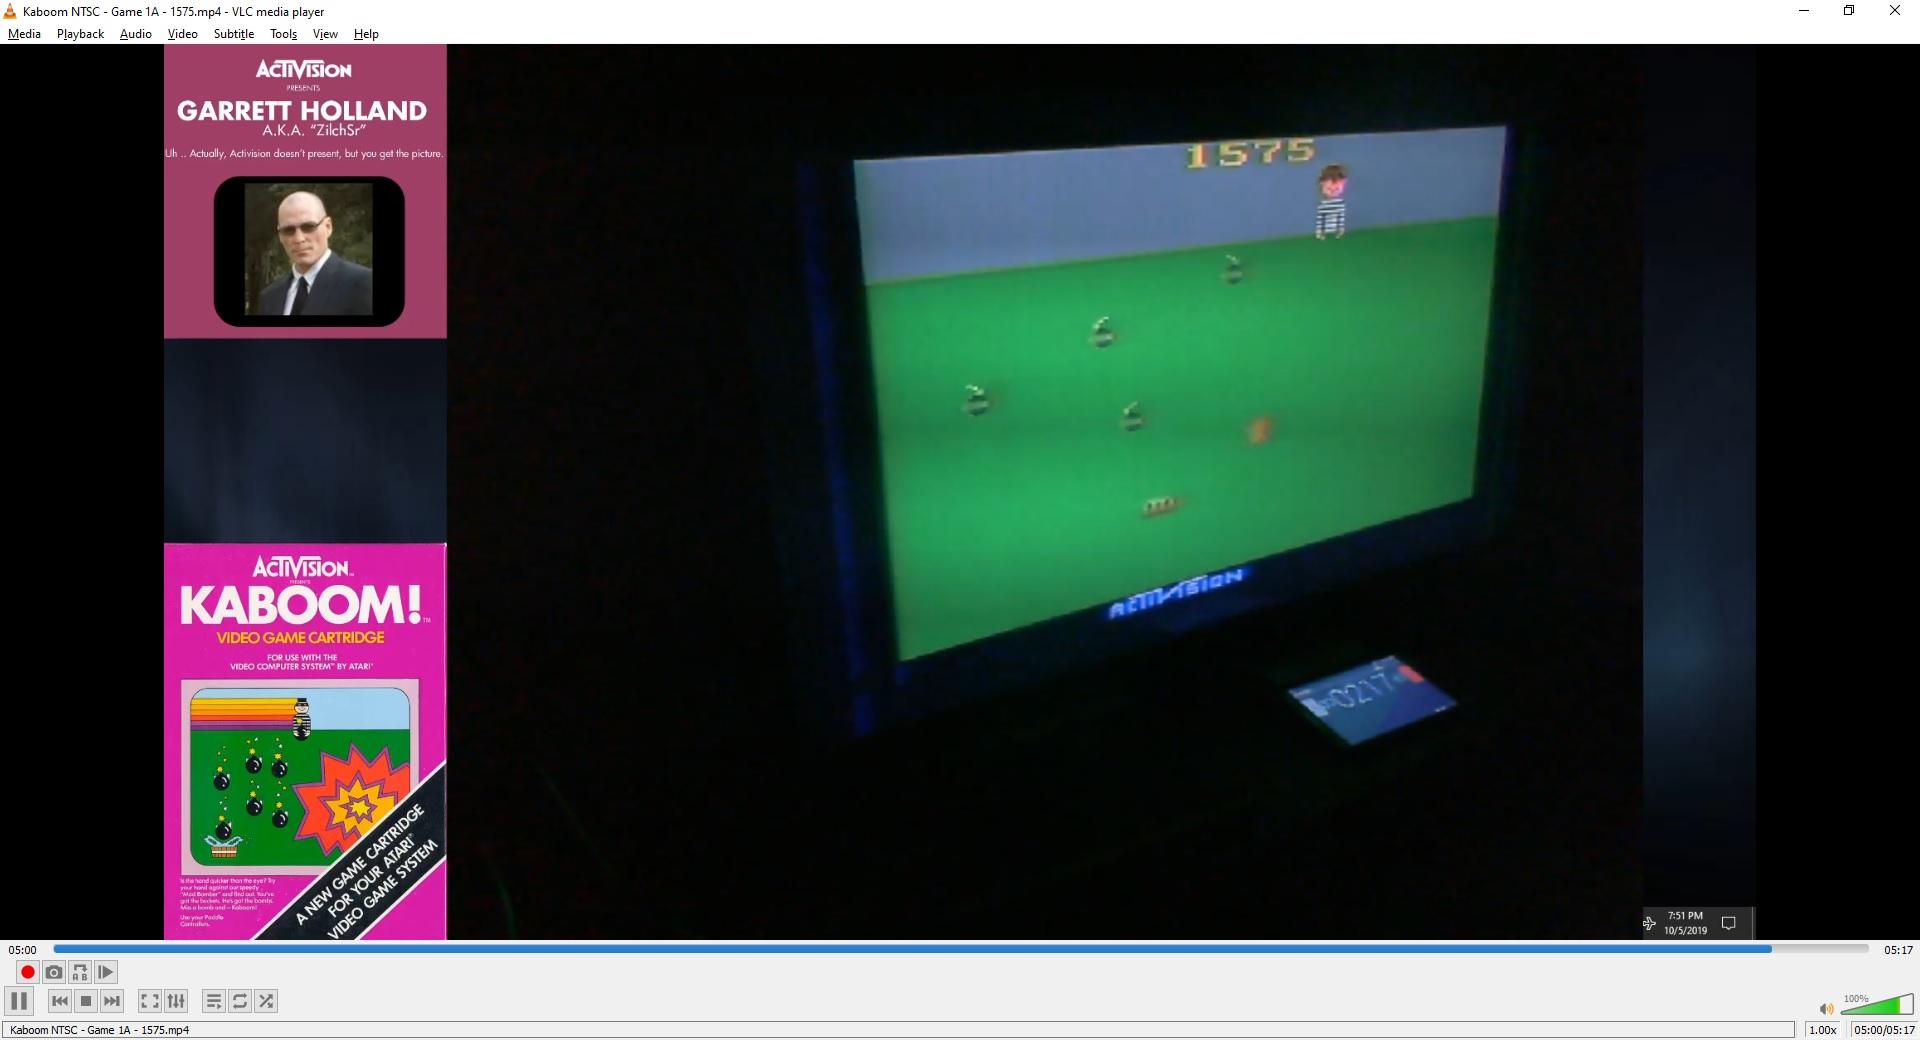 ZilchSr: Kaboom! (Atari 2600 Expert/A) 1,575 points on 2019-10-08 22:59:27